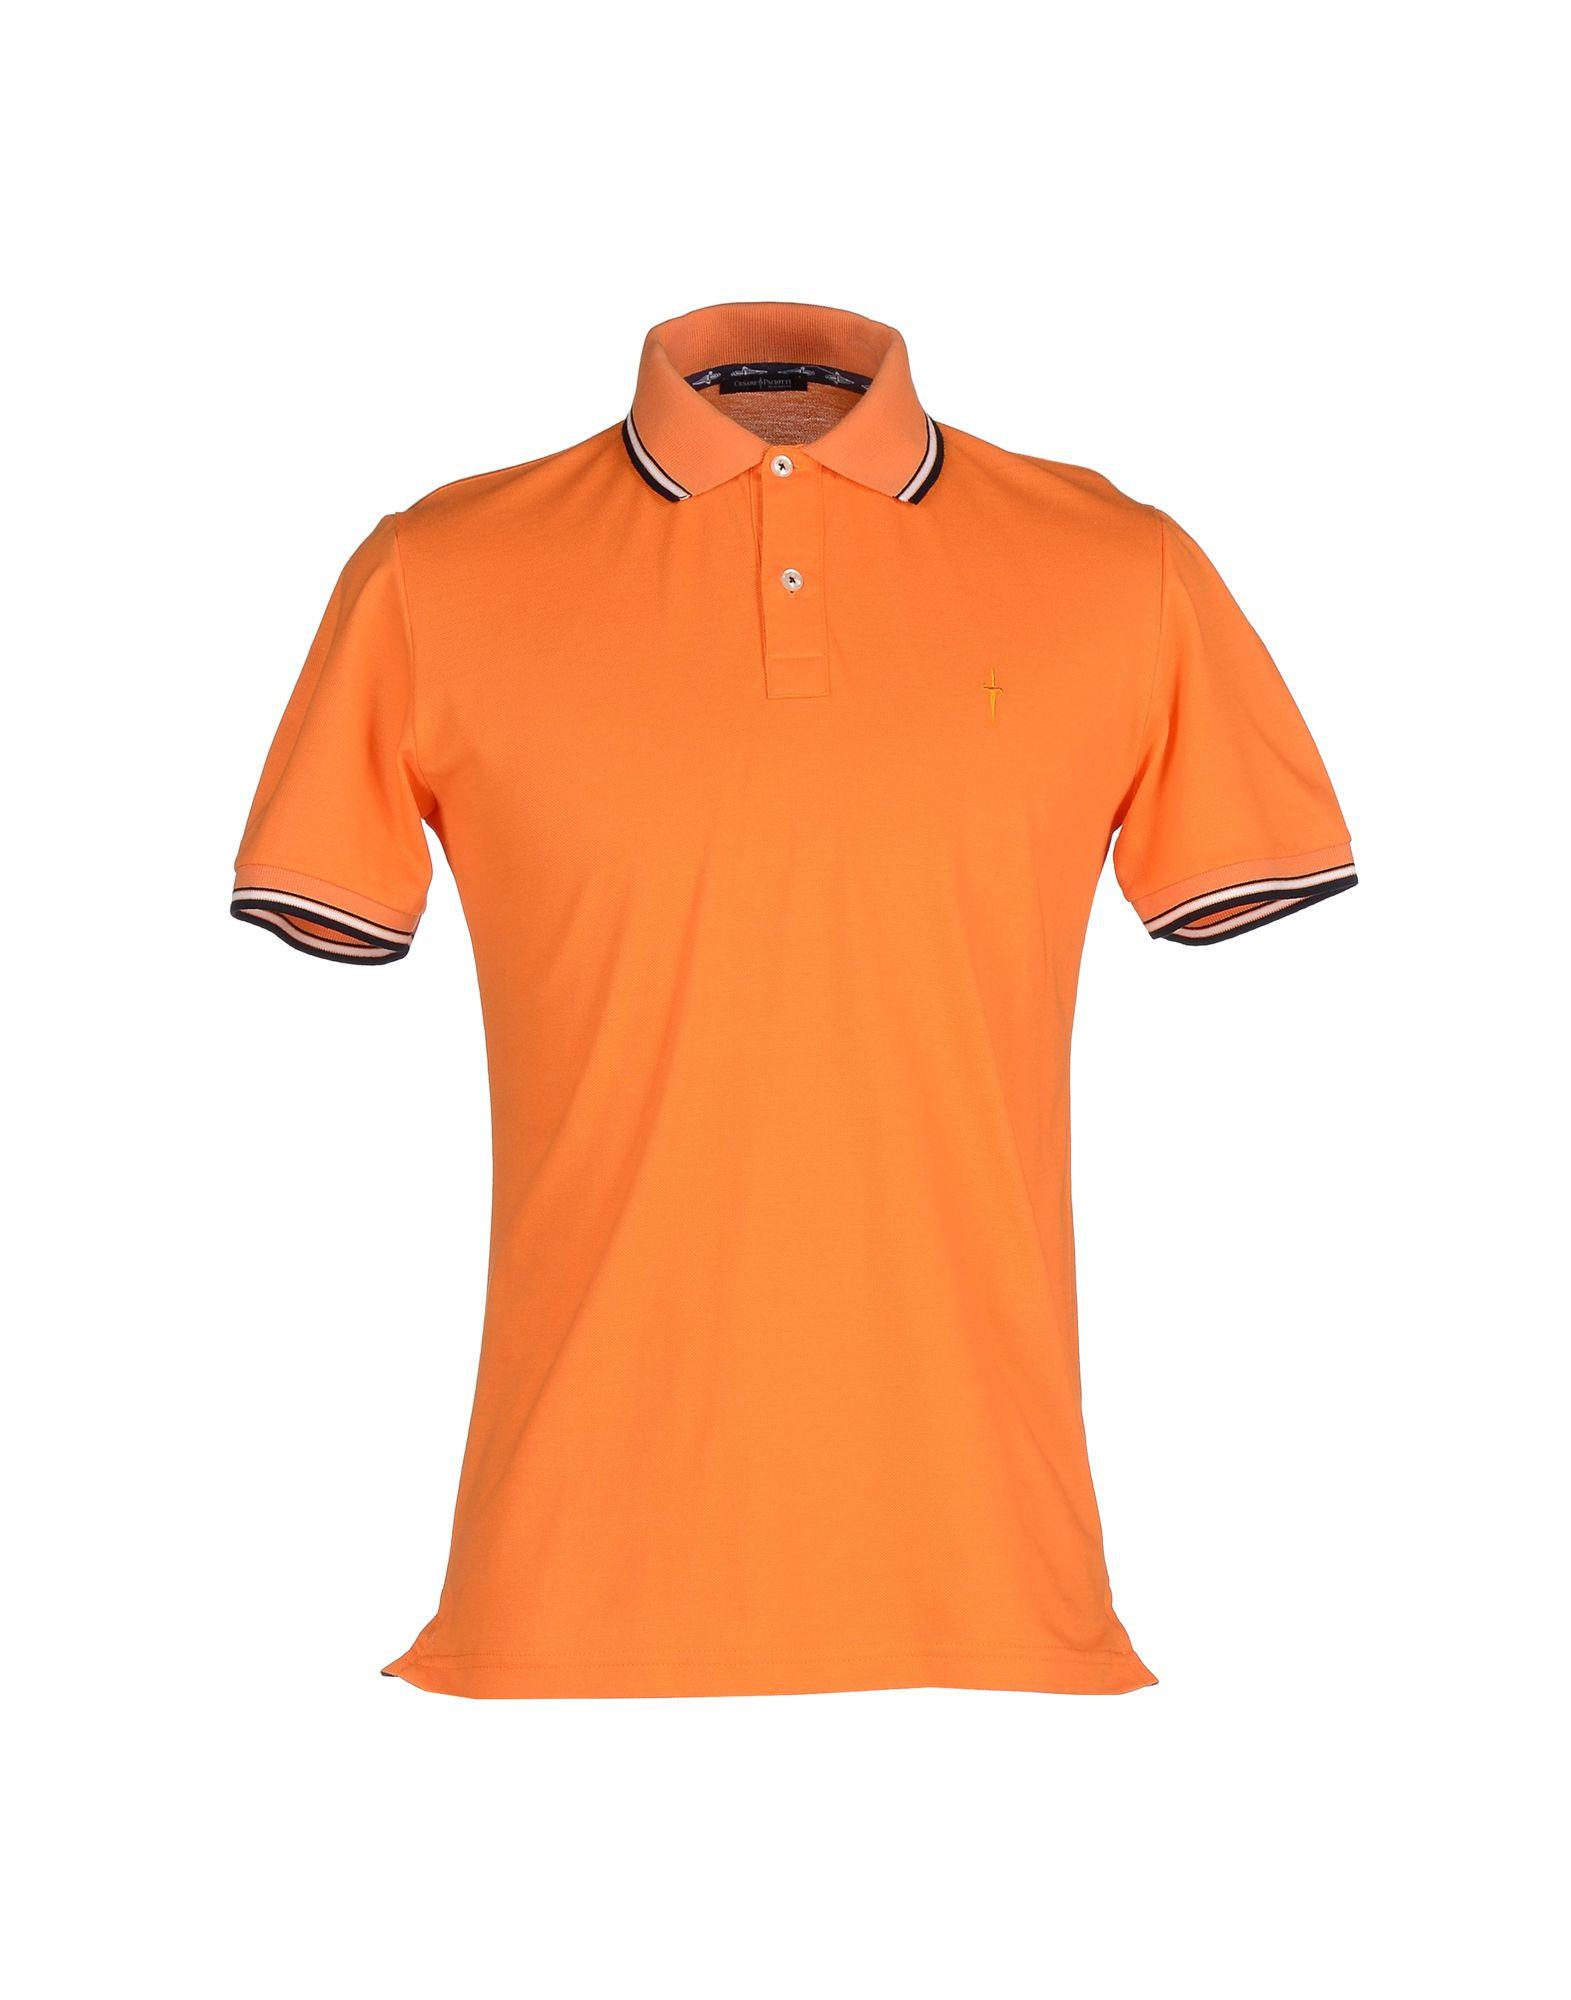 Cesare paciotti polo shirt in orange for men save 63 lyst for Orange polo shirt mens